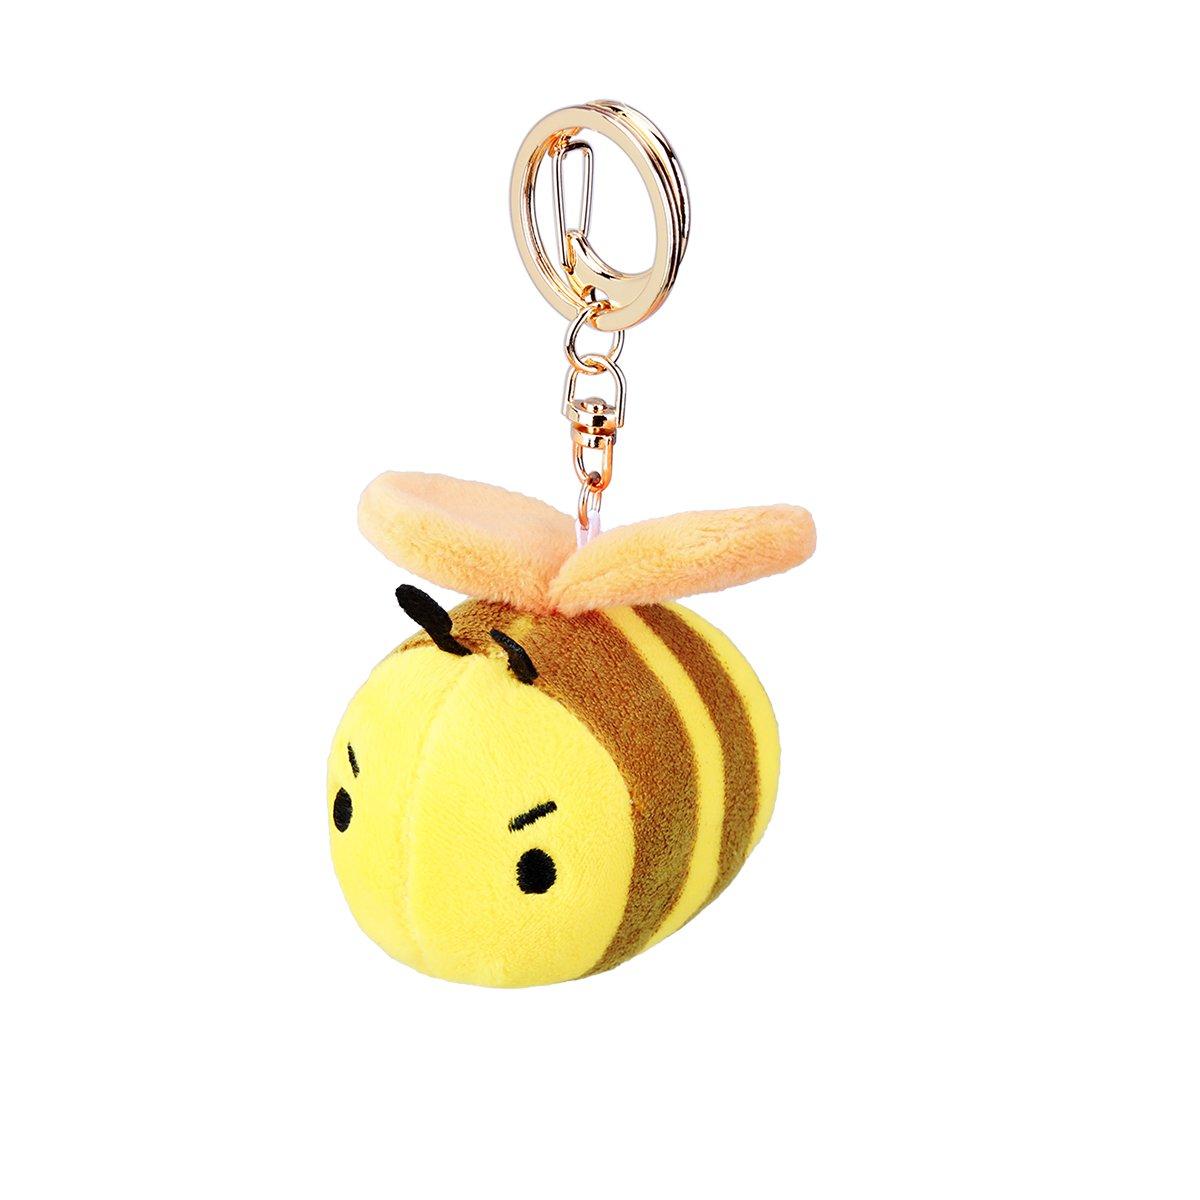 Bear Gentleman 130 Db Personal Alarm, Mini Bee SOS Panic Alarms for Women,Kids,Elder.Smart Positions Apps with Pin Anti Lost Design Bear Gentlemam 900096